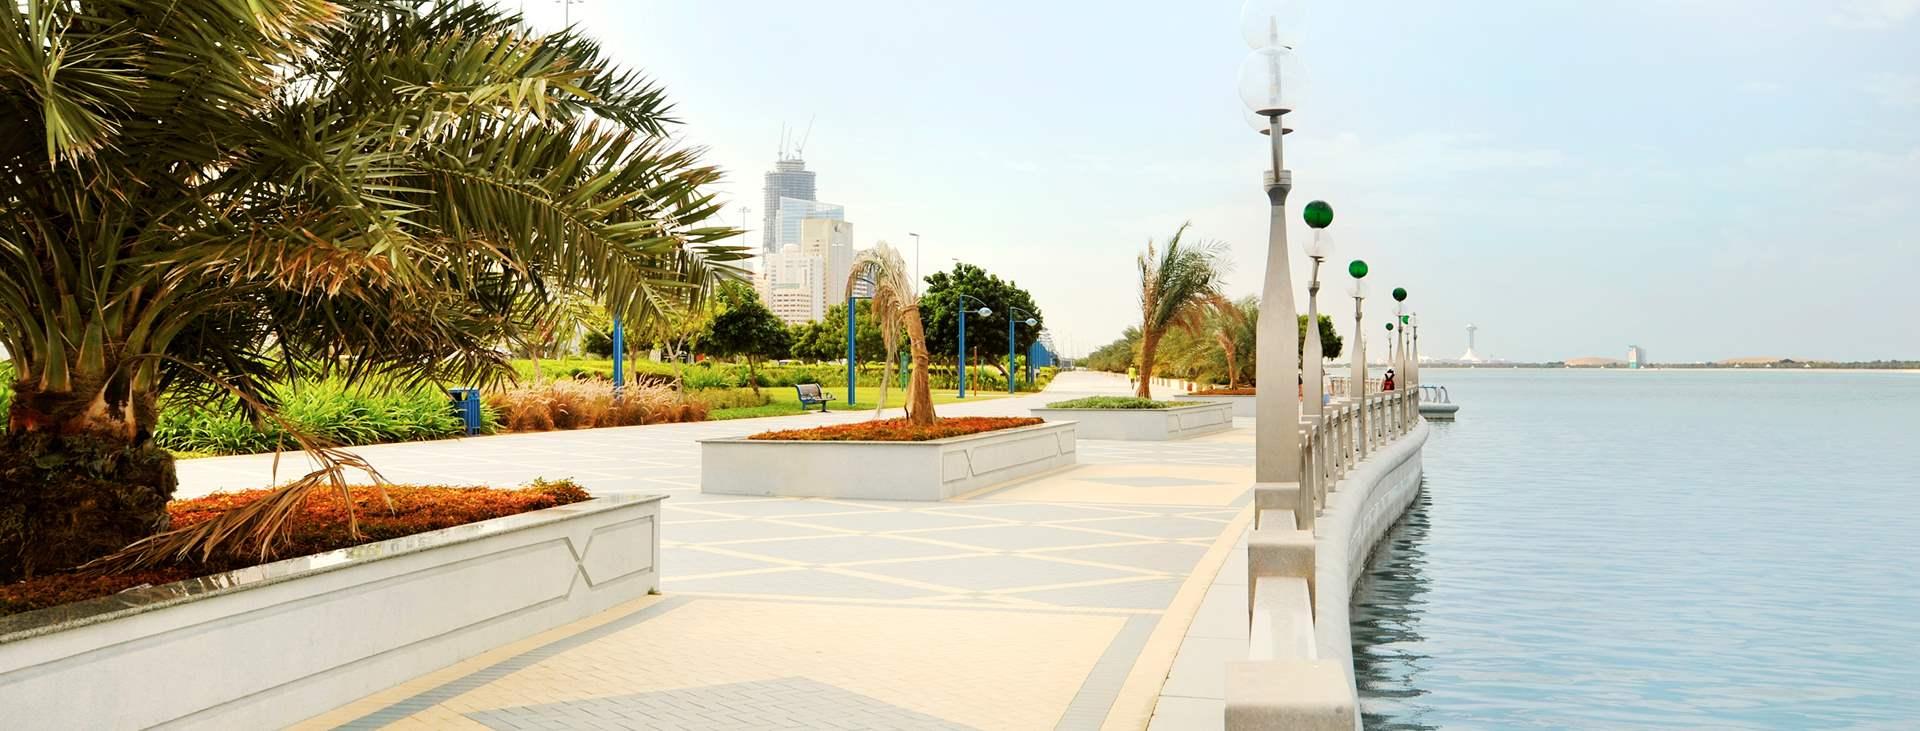 Boka en resa till Abu Dhabi med Ving